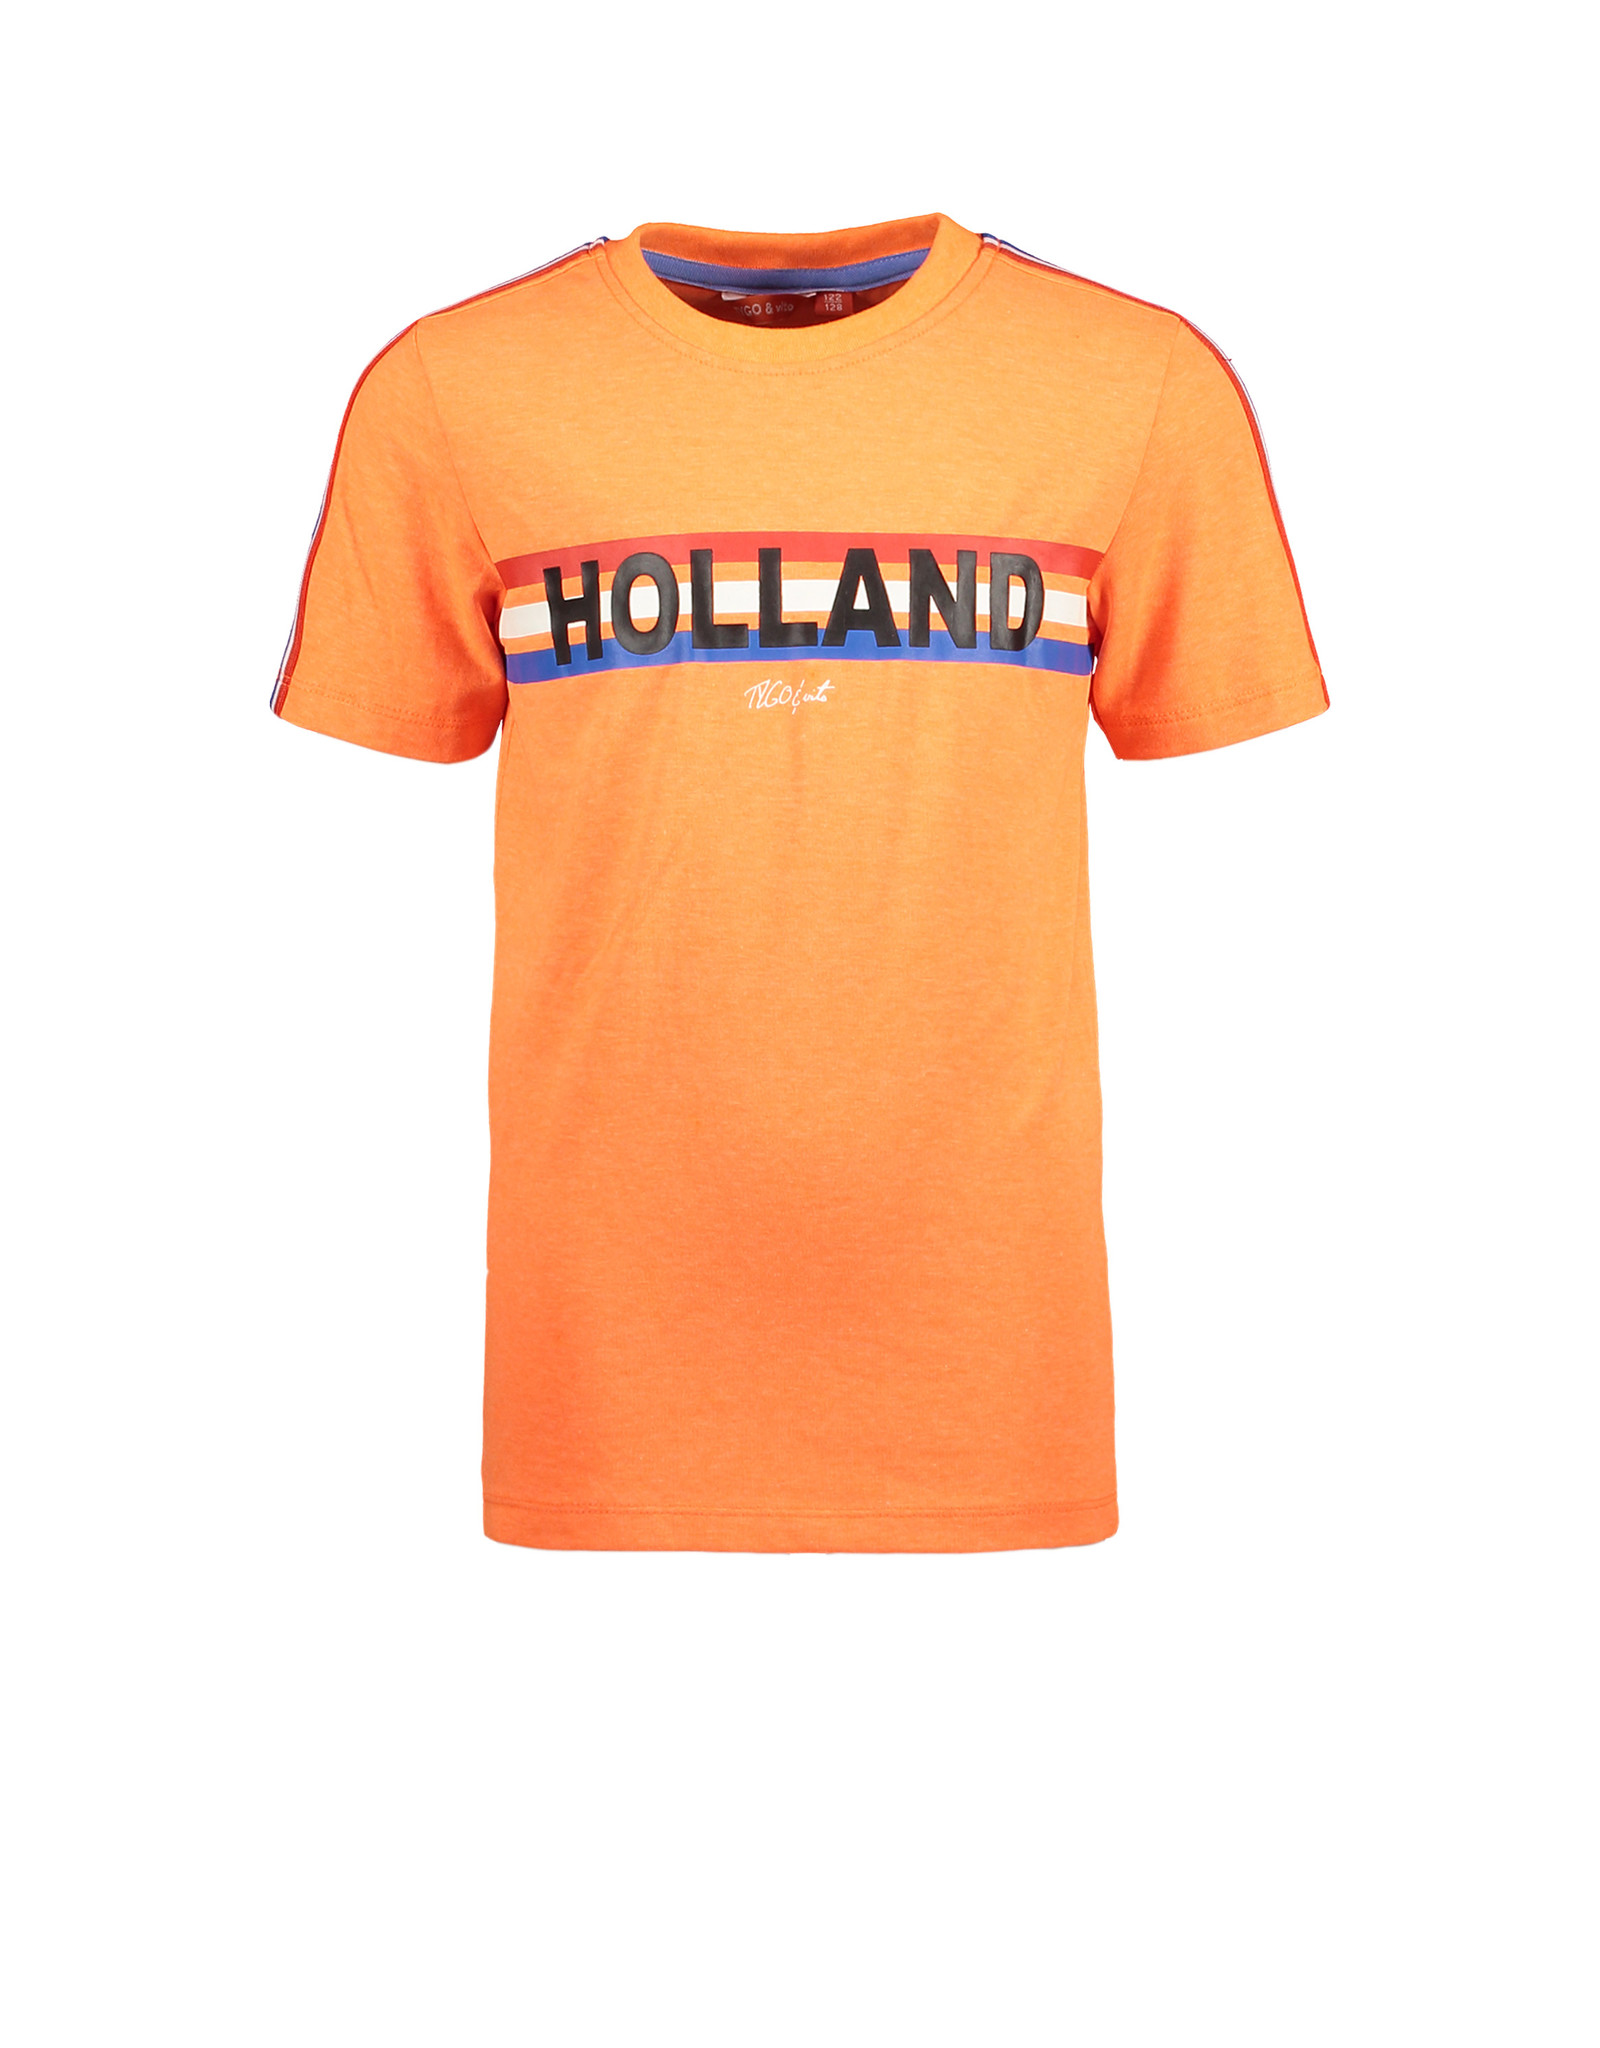 Tygo & Vito neon T-shirt 'Holland'